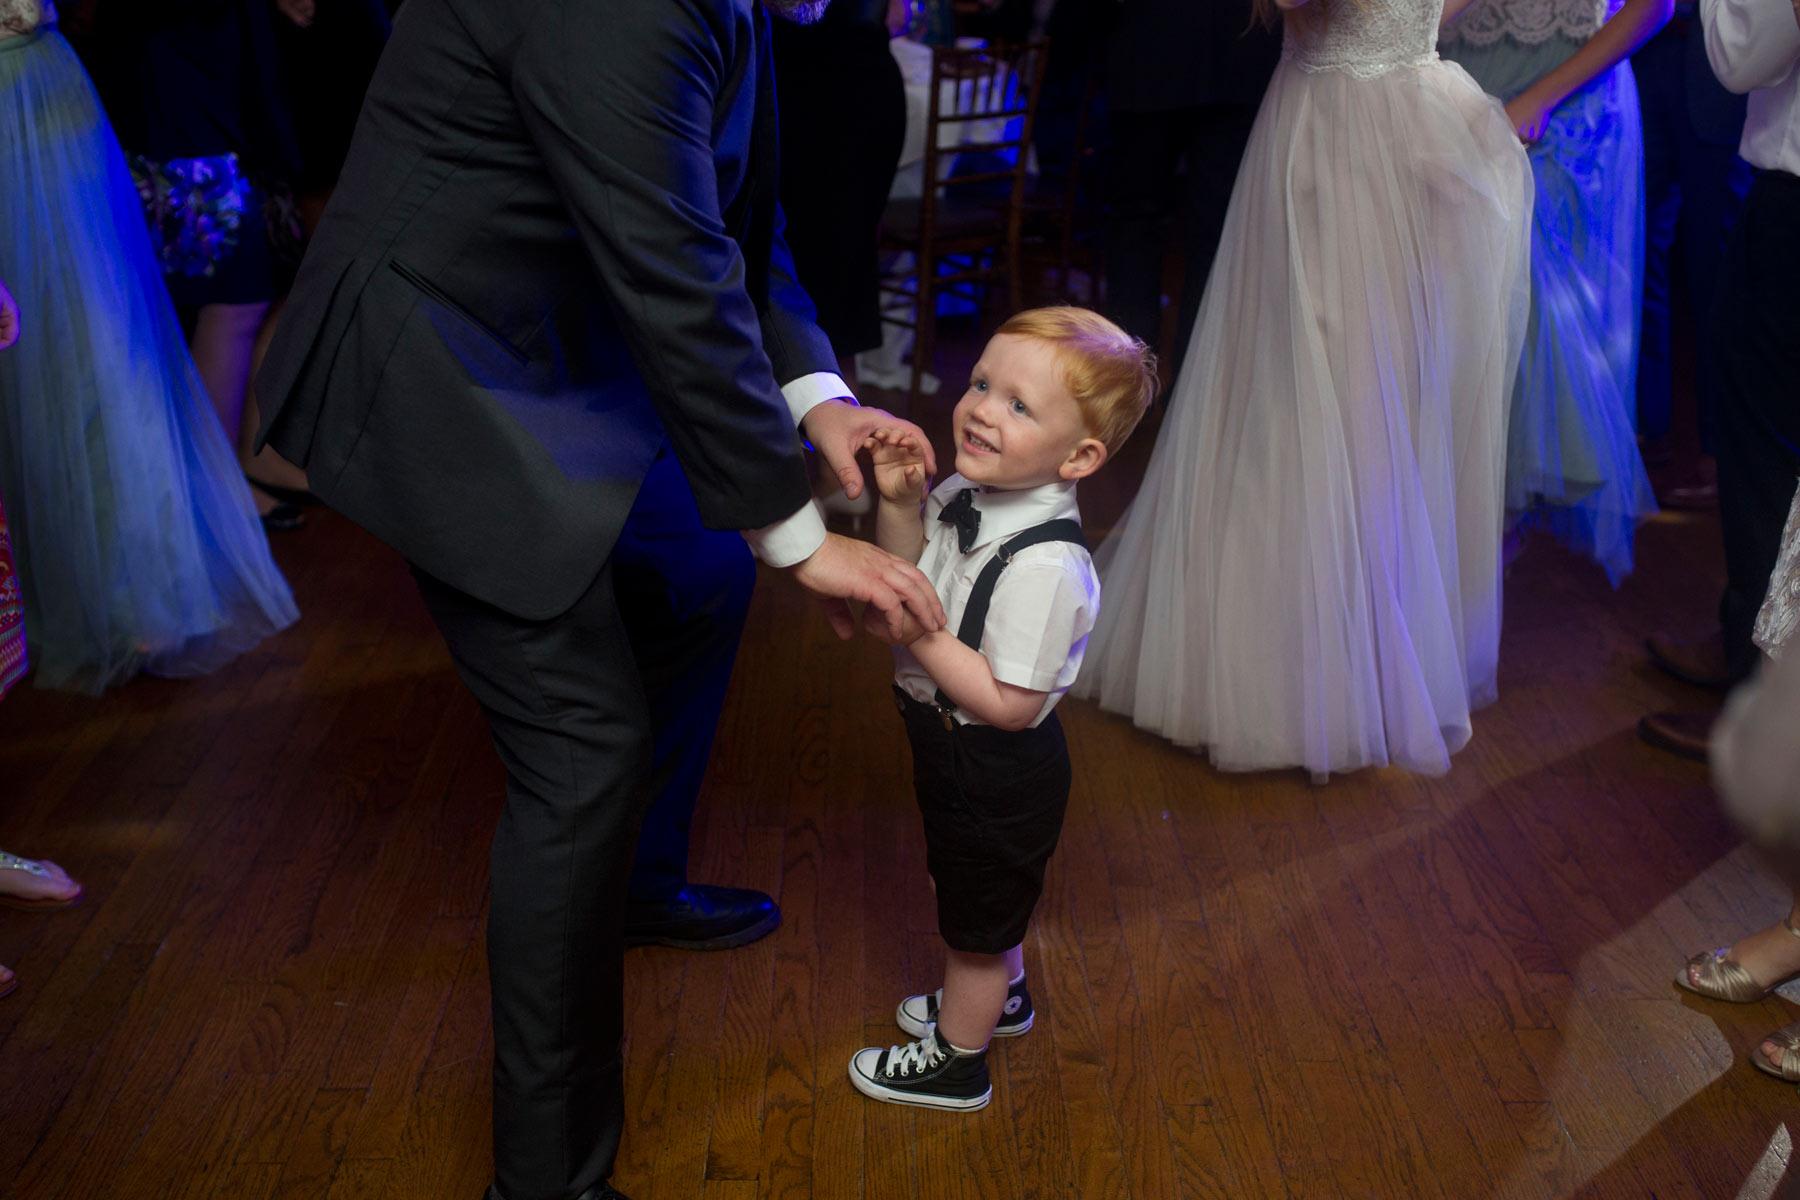 Bucks_County_wedding_photographer_Stroudsmoor_country_inn_wedding_Philadelphia_wedding_photographer_32_baby_boy_on_dance_floor.JPG